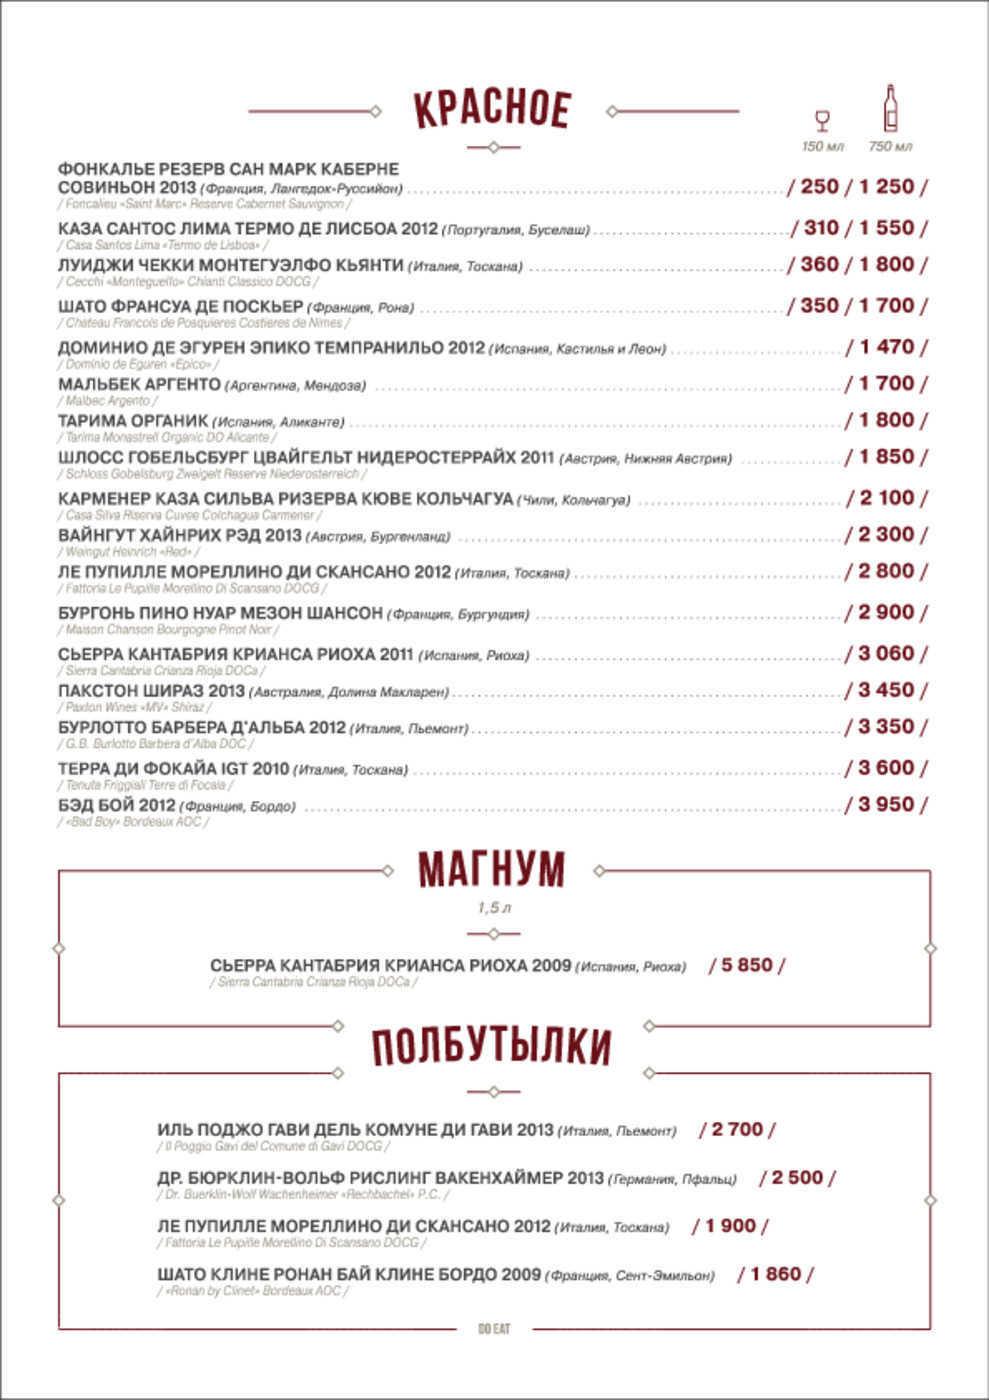 Меню ресторана Do eat на Малом проспекте П.С.